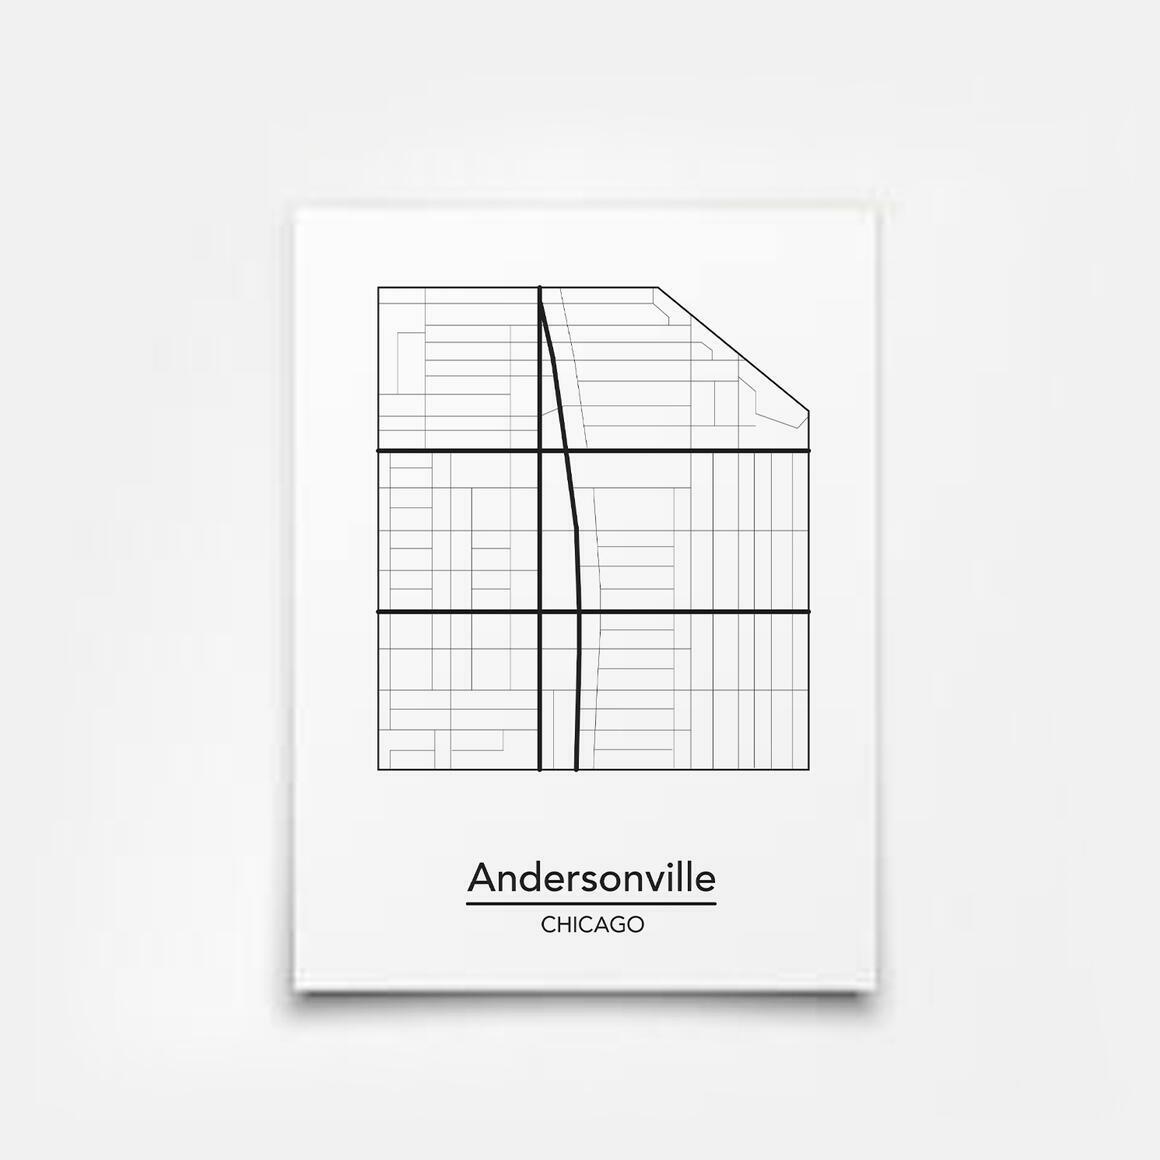 Andersonville - Chicago Neighborhood Map Print | Trada Marketplace